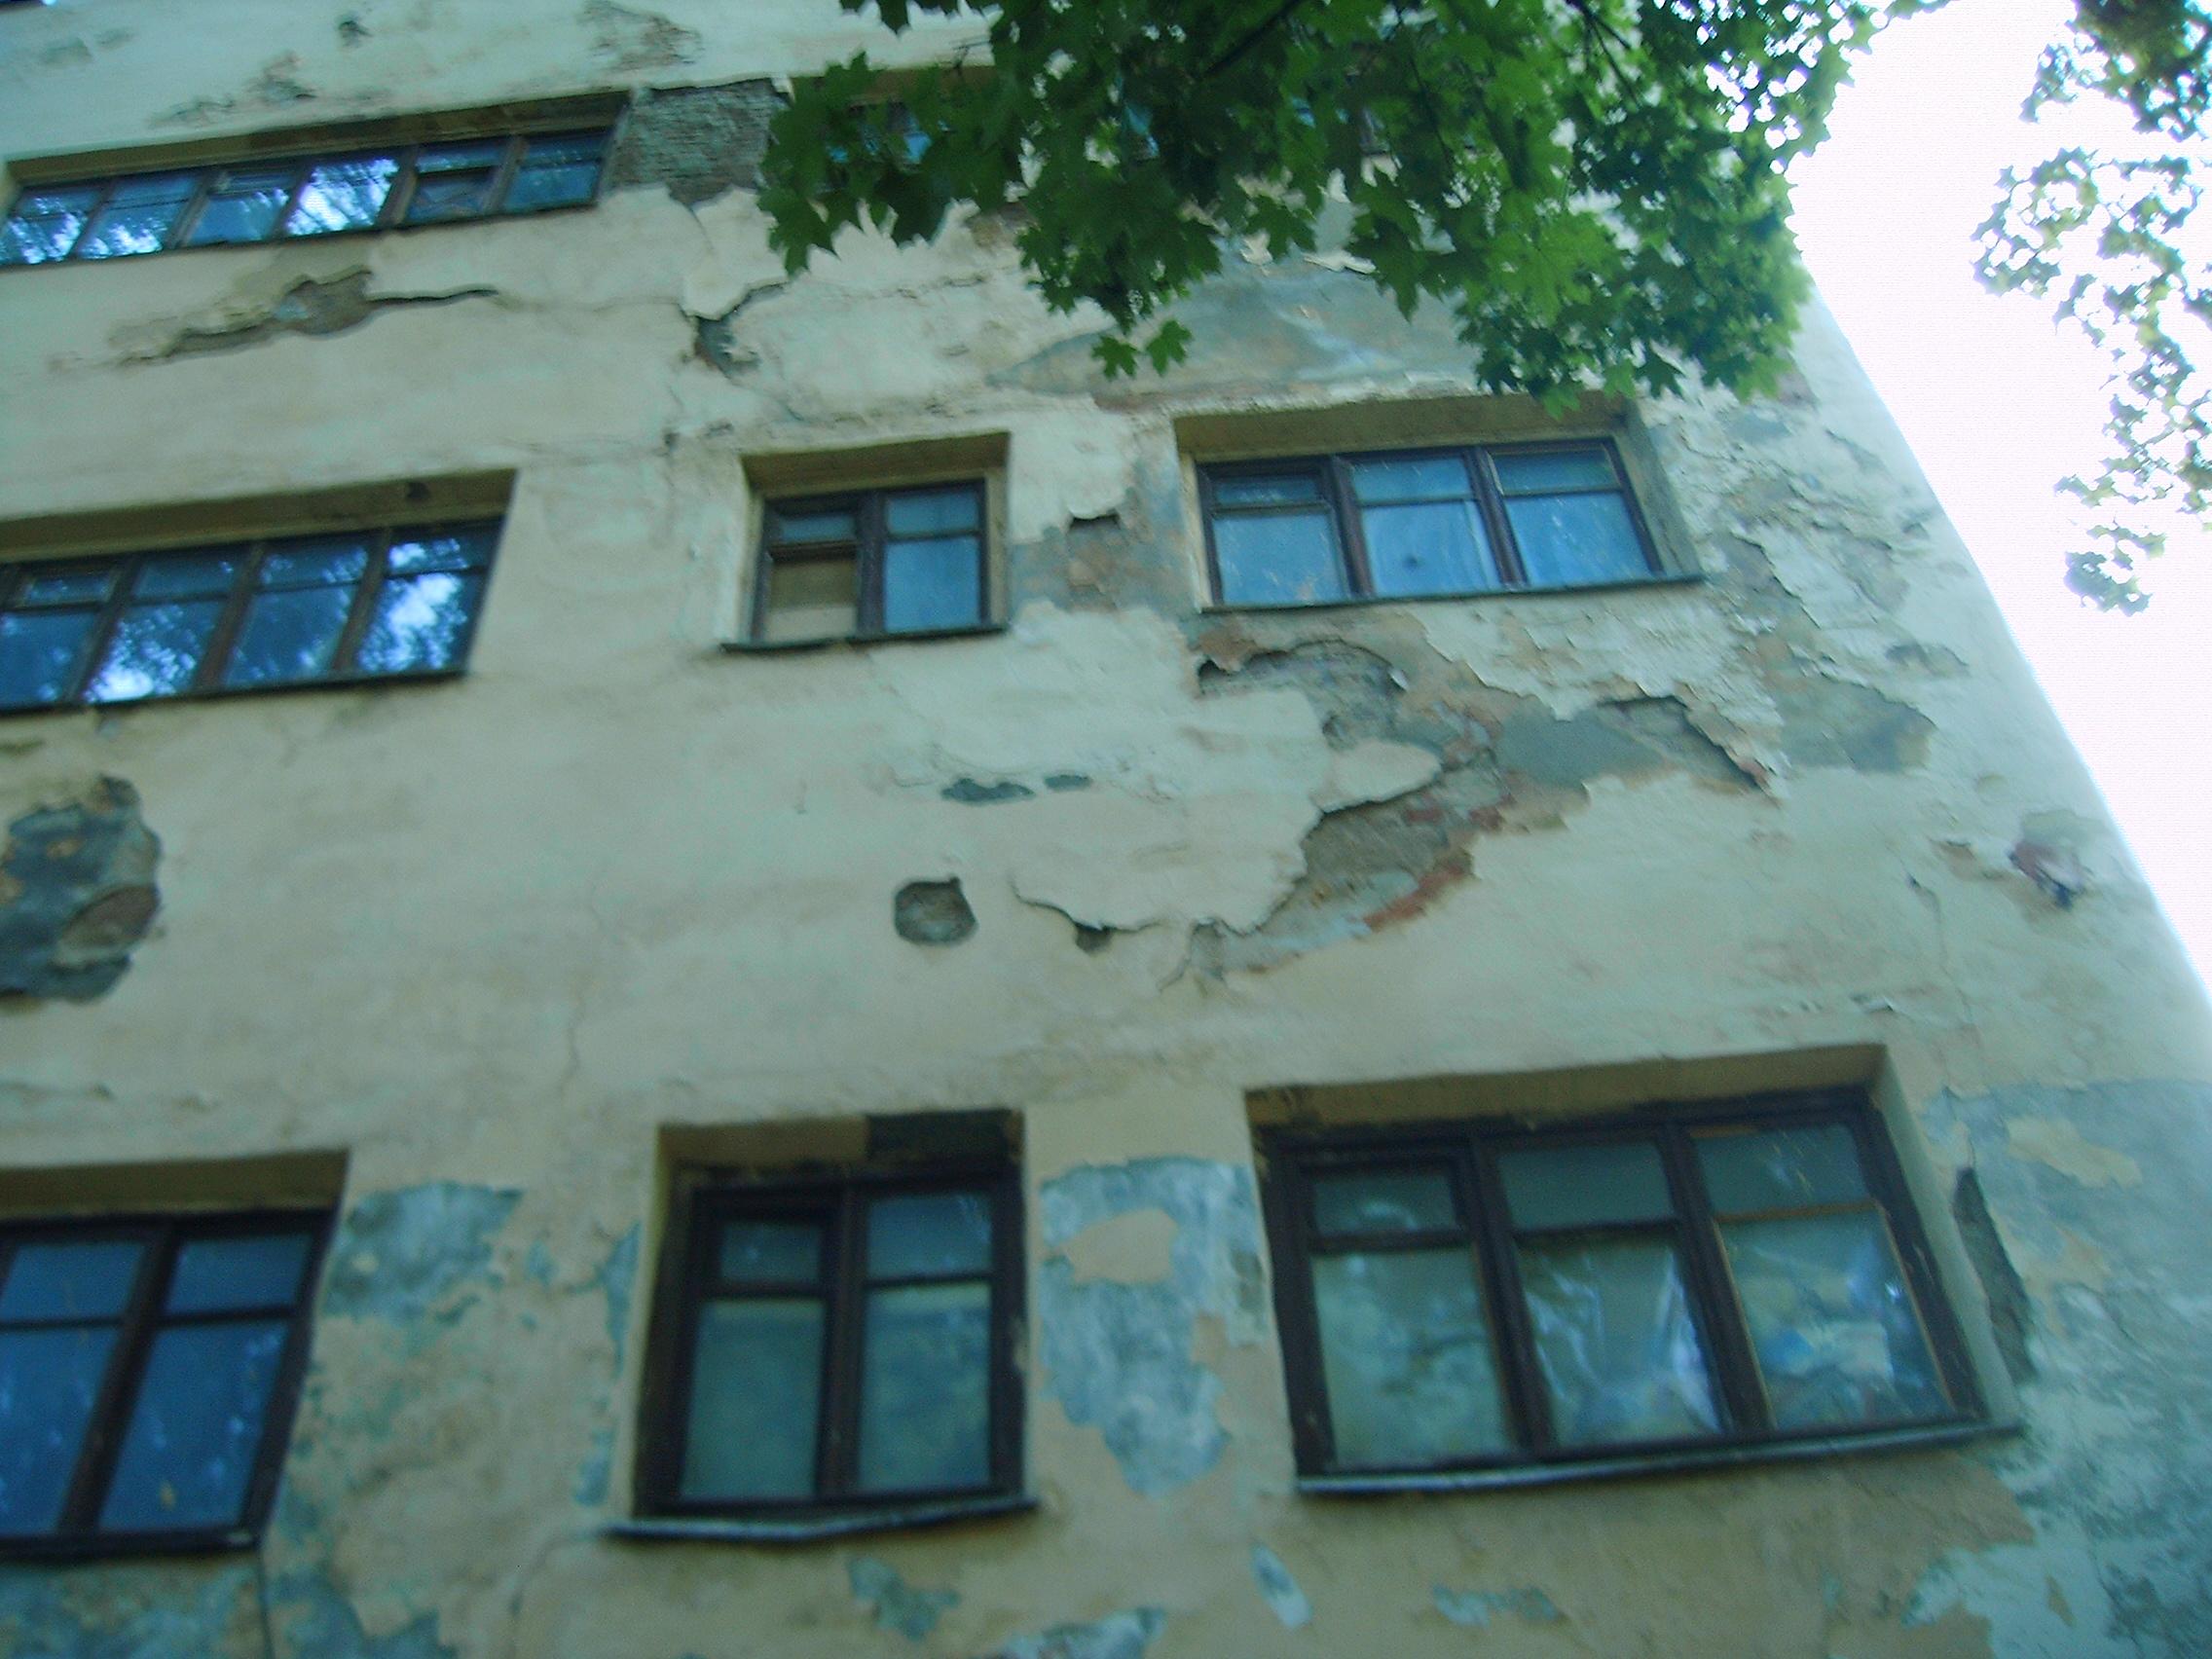 http://pics.livejournal.com/dedushka_pixto/pic/0000q4pe